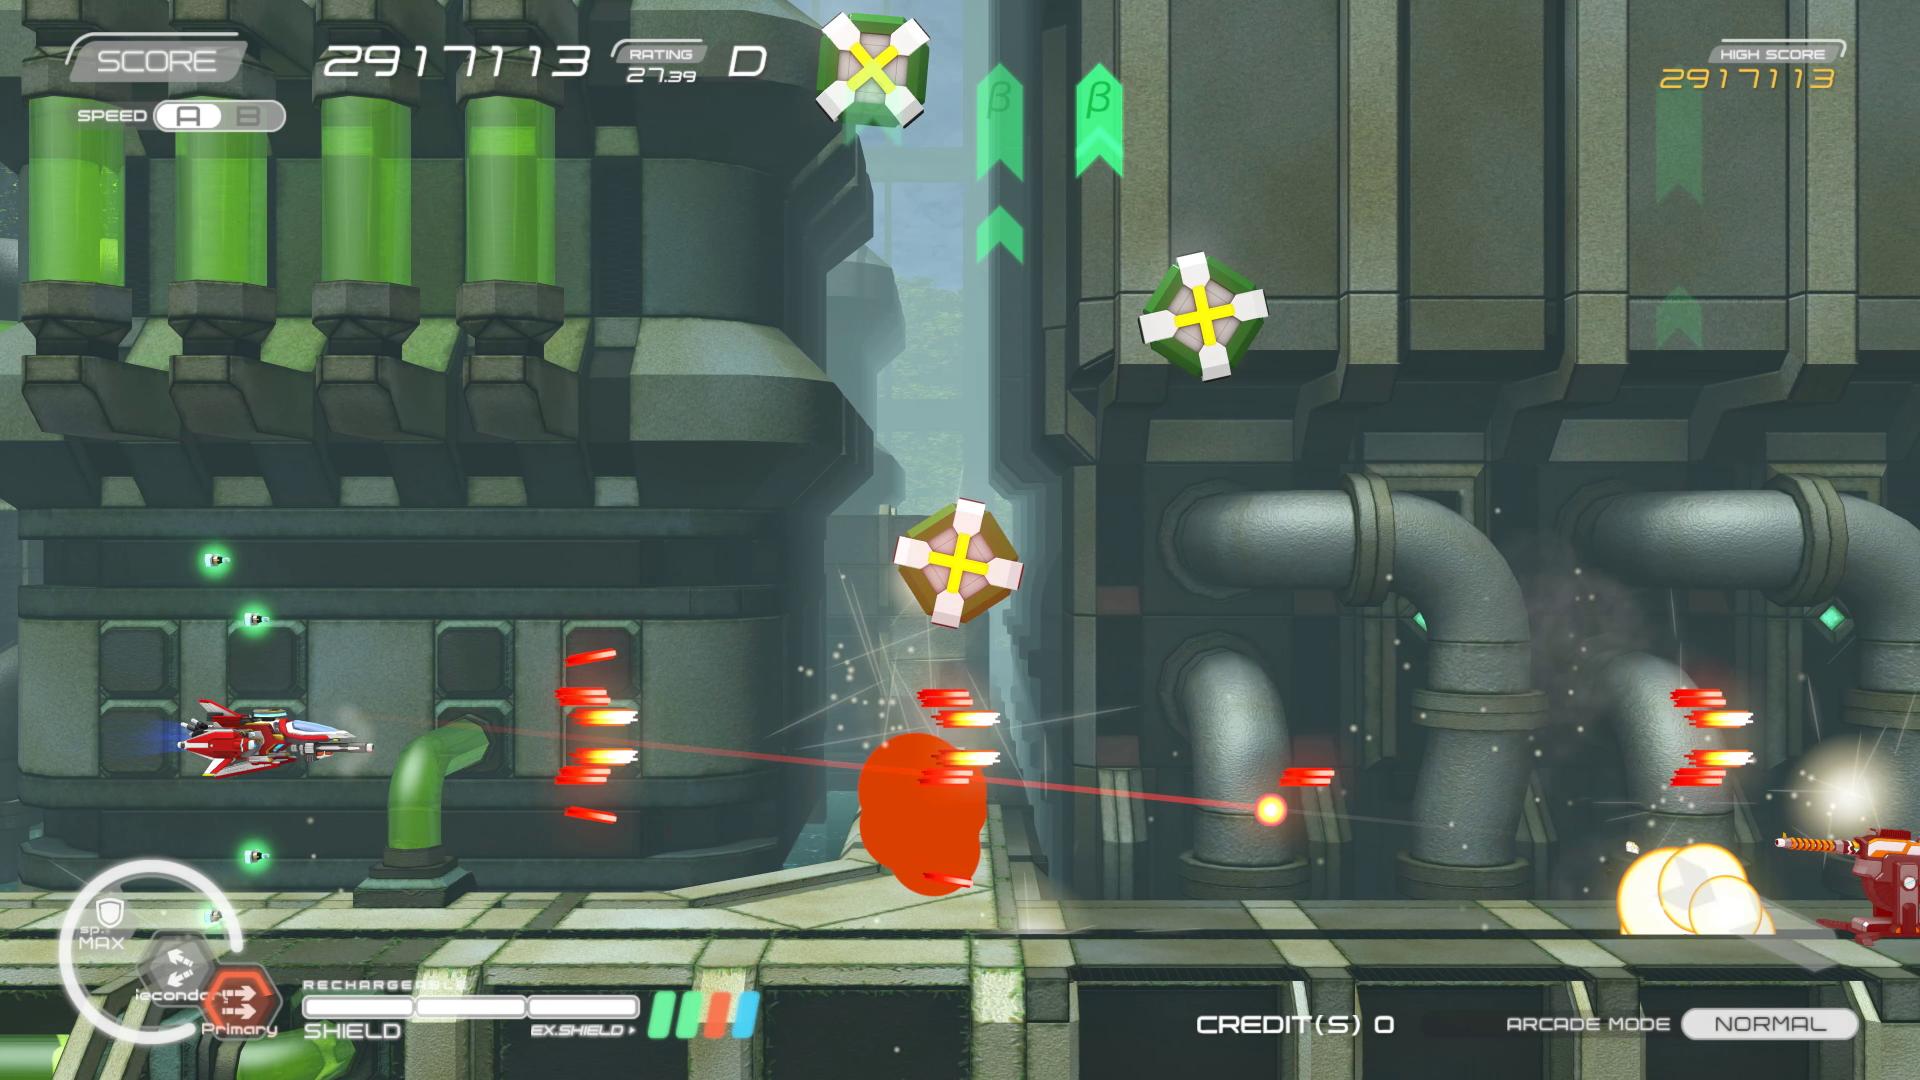 A screenshot from Natsuku Chronicles